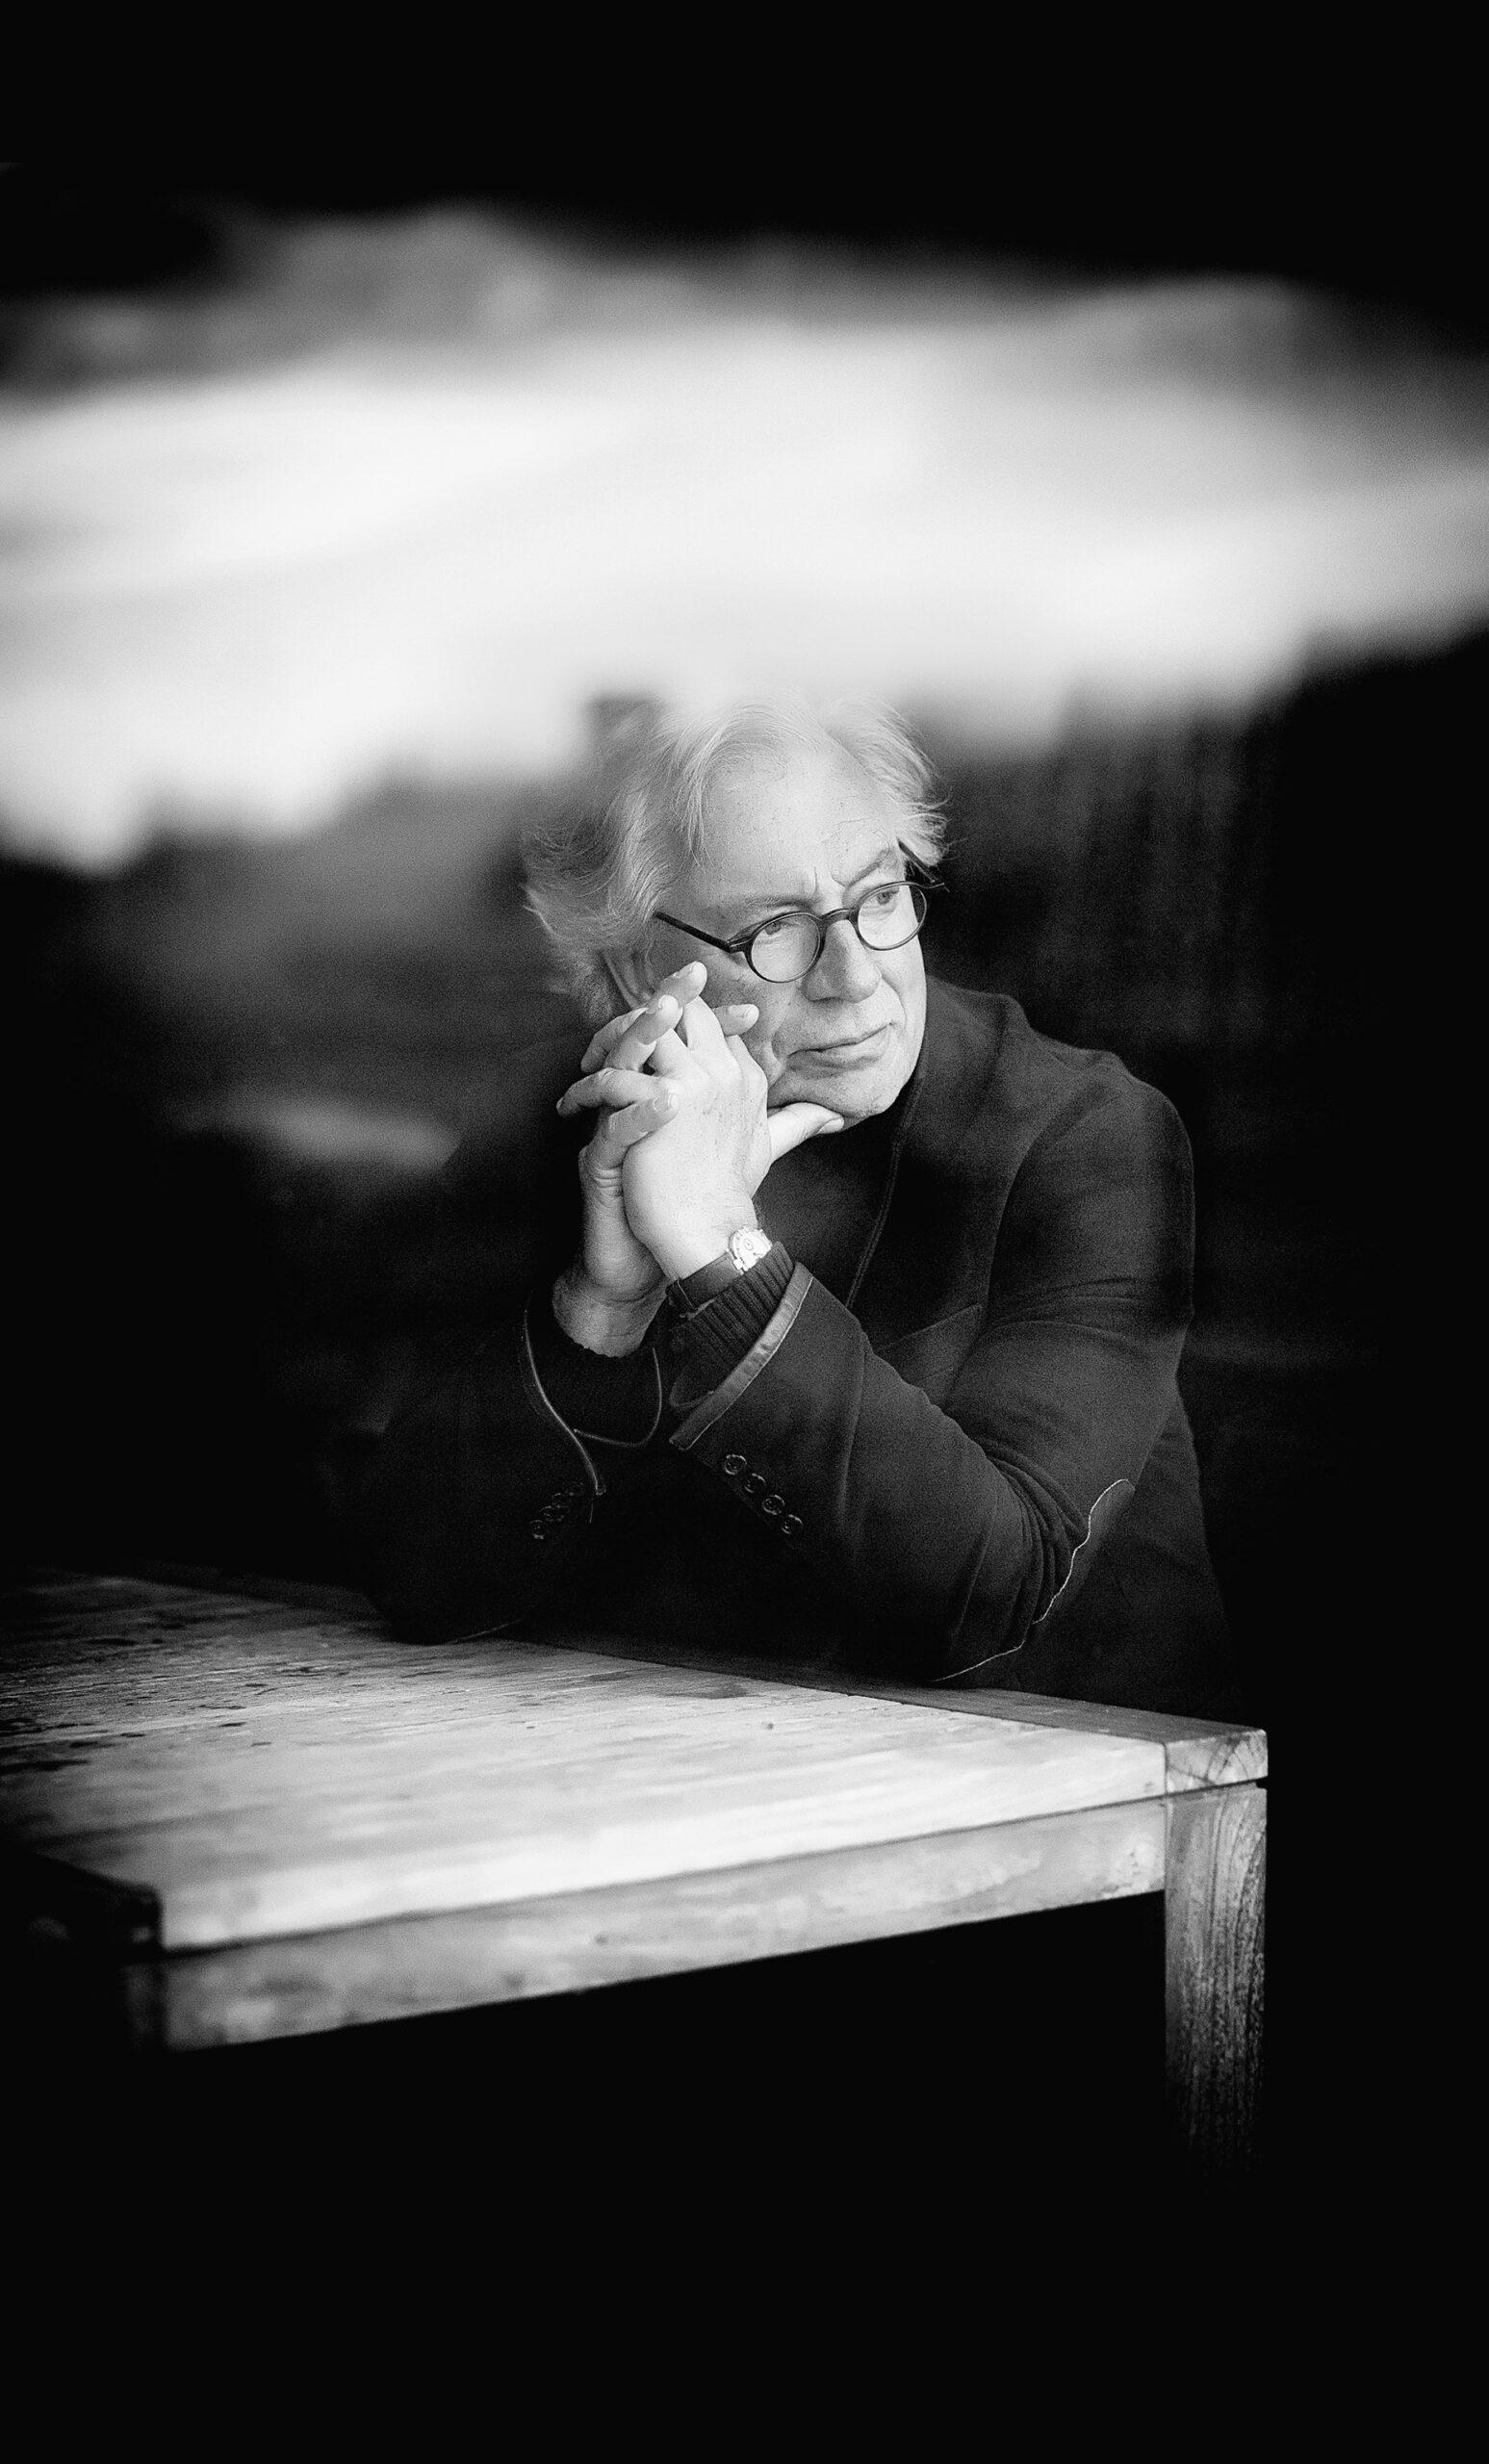 Looking at the North Sea , taken through the window of a restaurant by Hans van der Woerd, 2015.